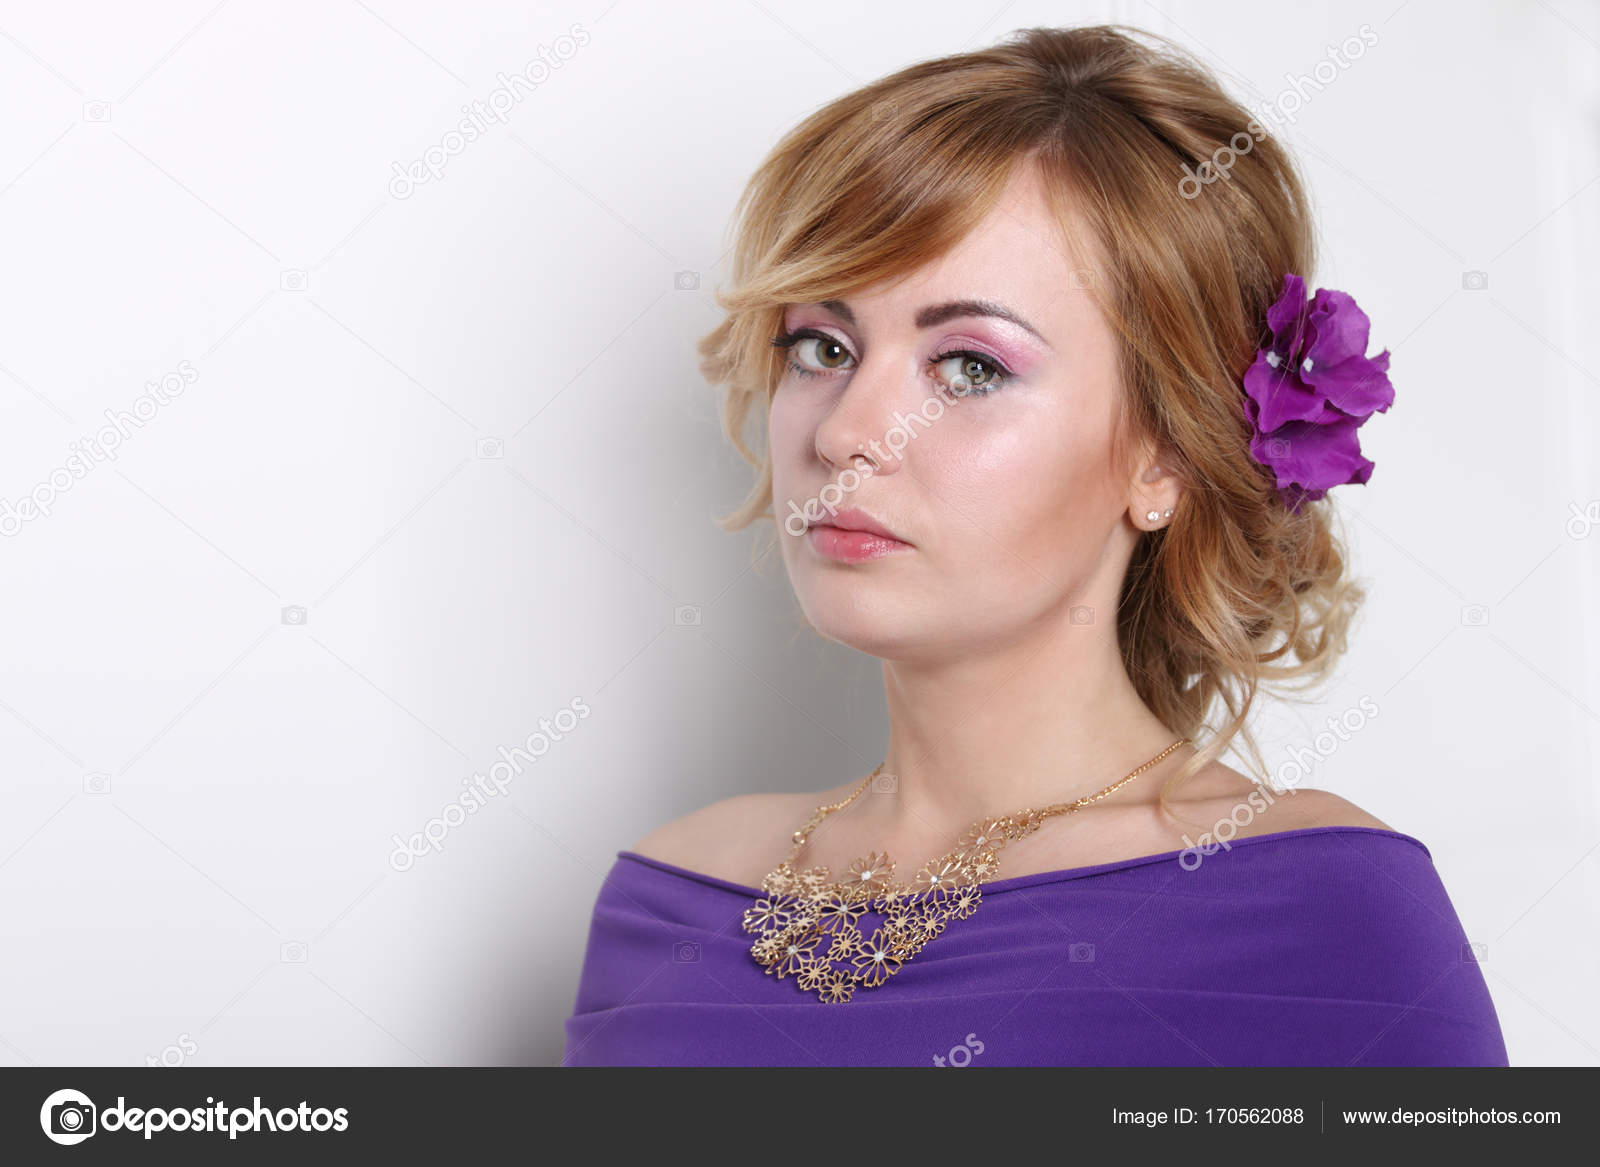 3b3981a1817f Όμορφη νεαρή ξανθιά γυναίκα στο μωβ φόρεμα με καθαρό δέρμα — Φωτογραφία  Αρχείου